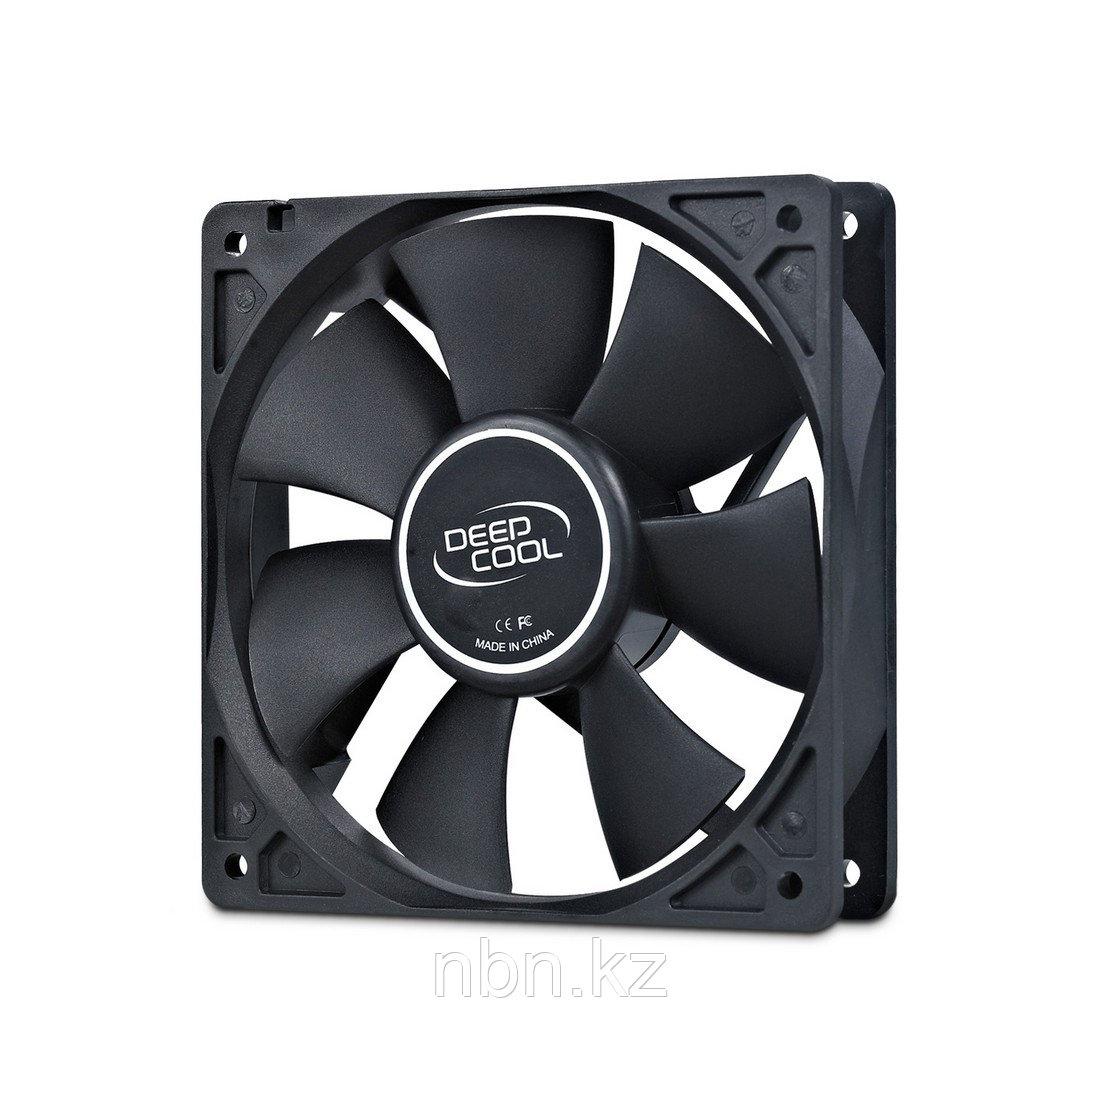 Кулер для компьютерного корпуса Deepcool XFAN 120